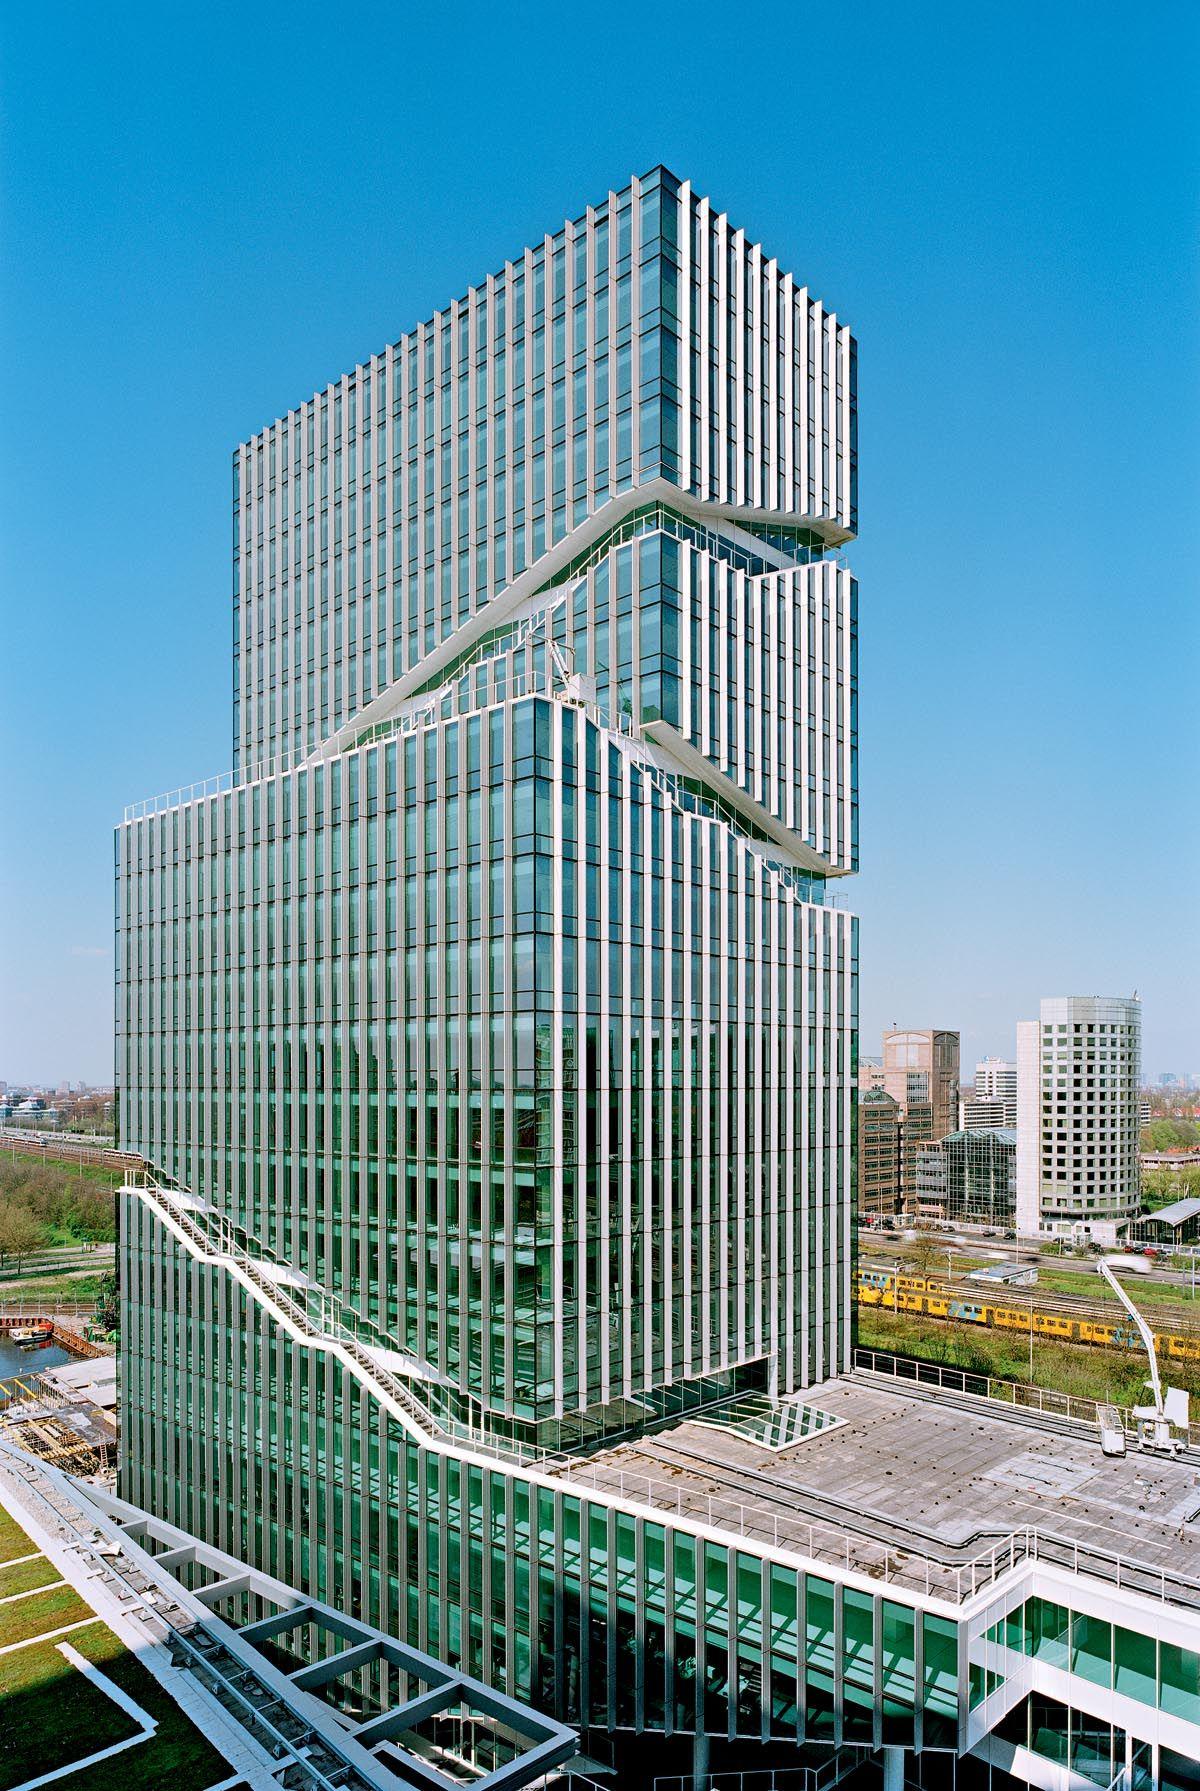 Mahler 4 Office Tower Amsterdam, The Netherlands